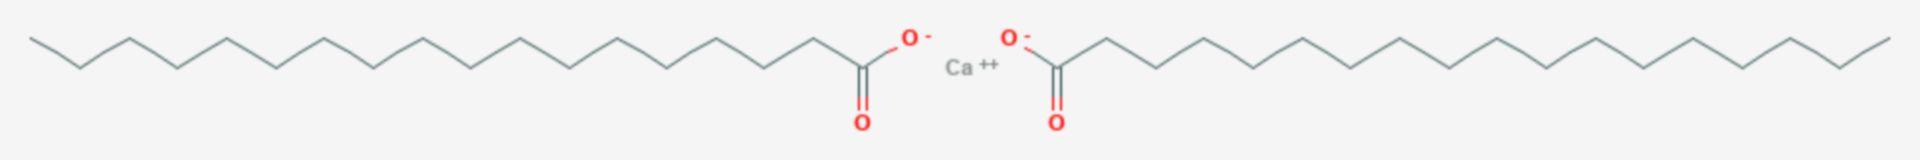 Calciumstearat (Strukturformel)